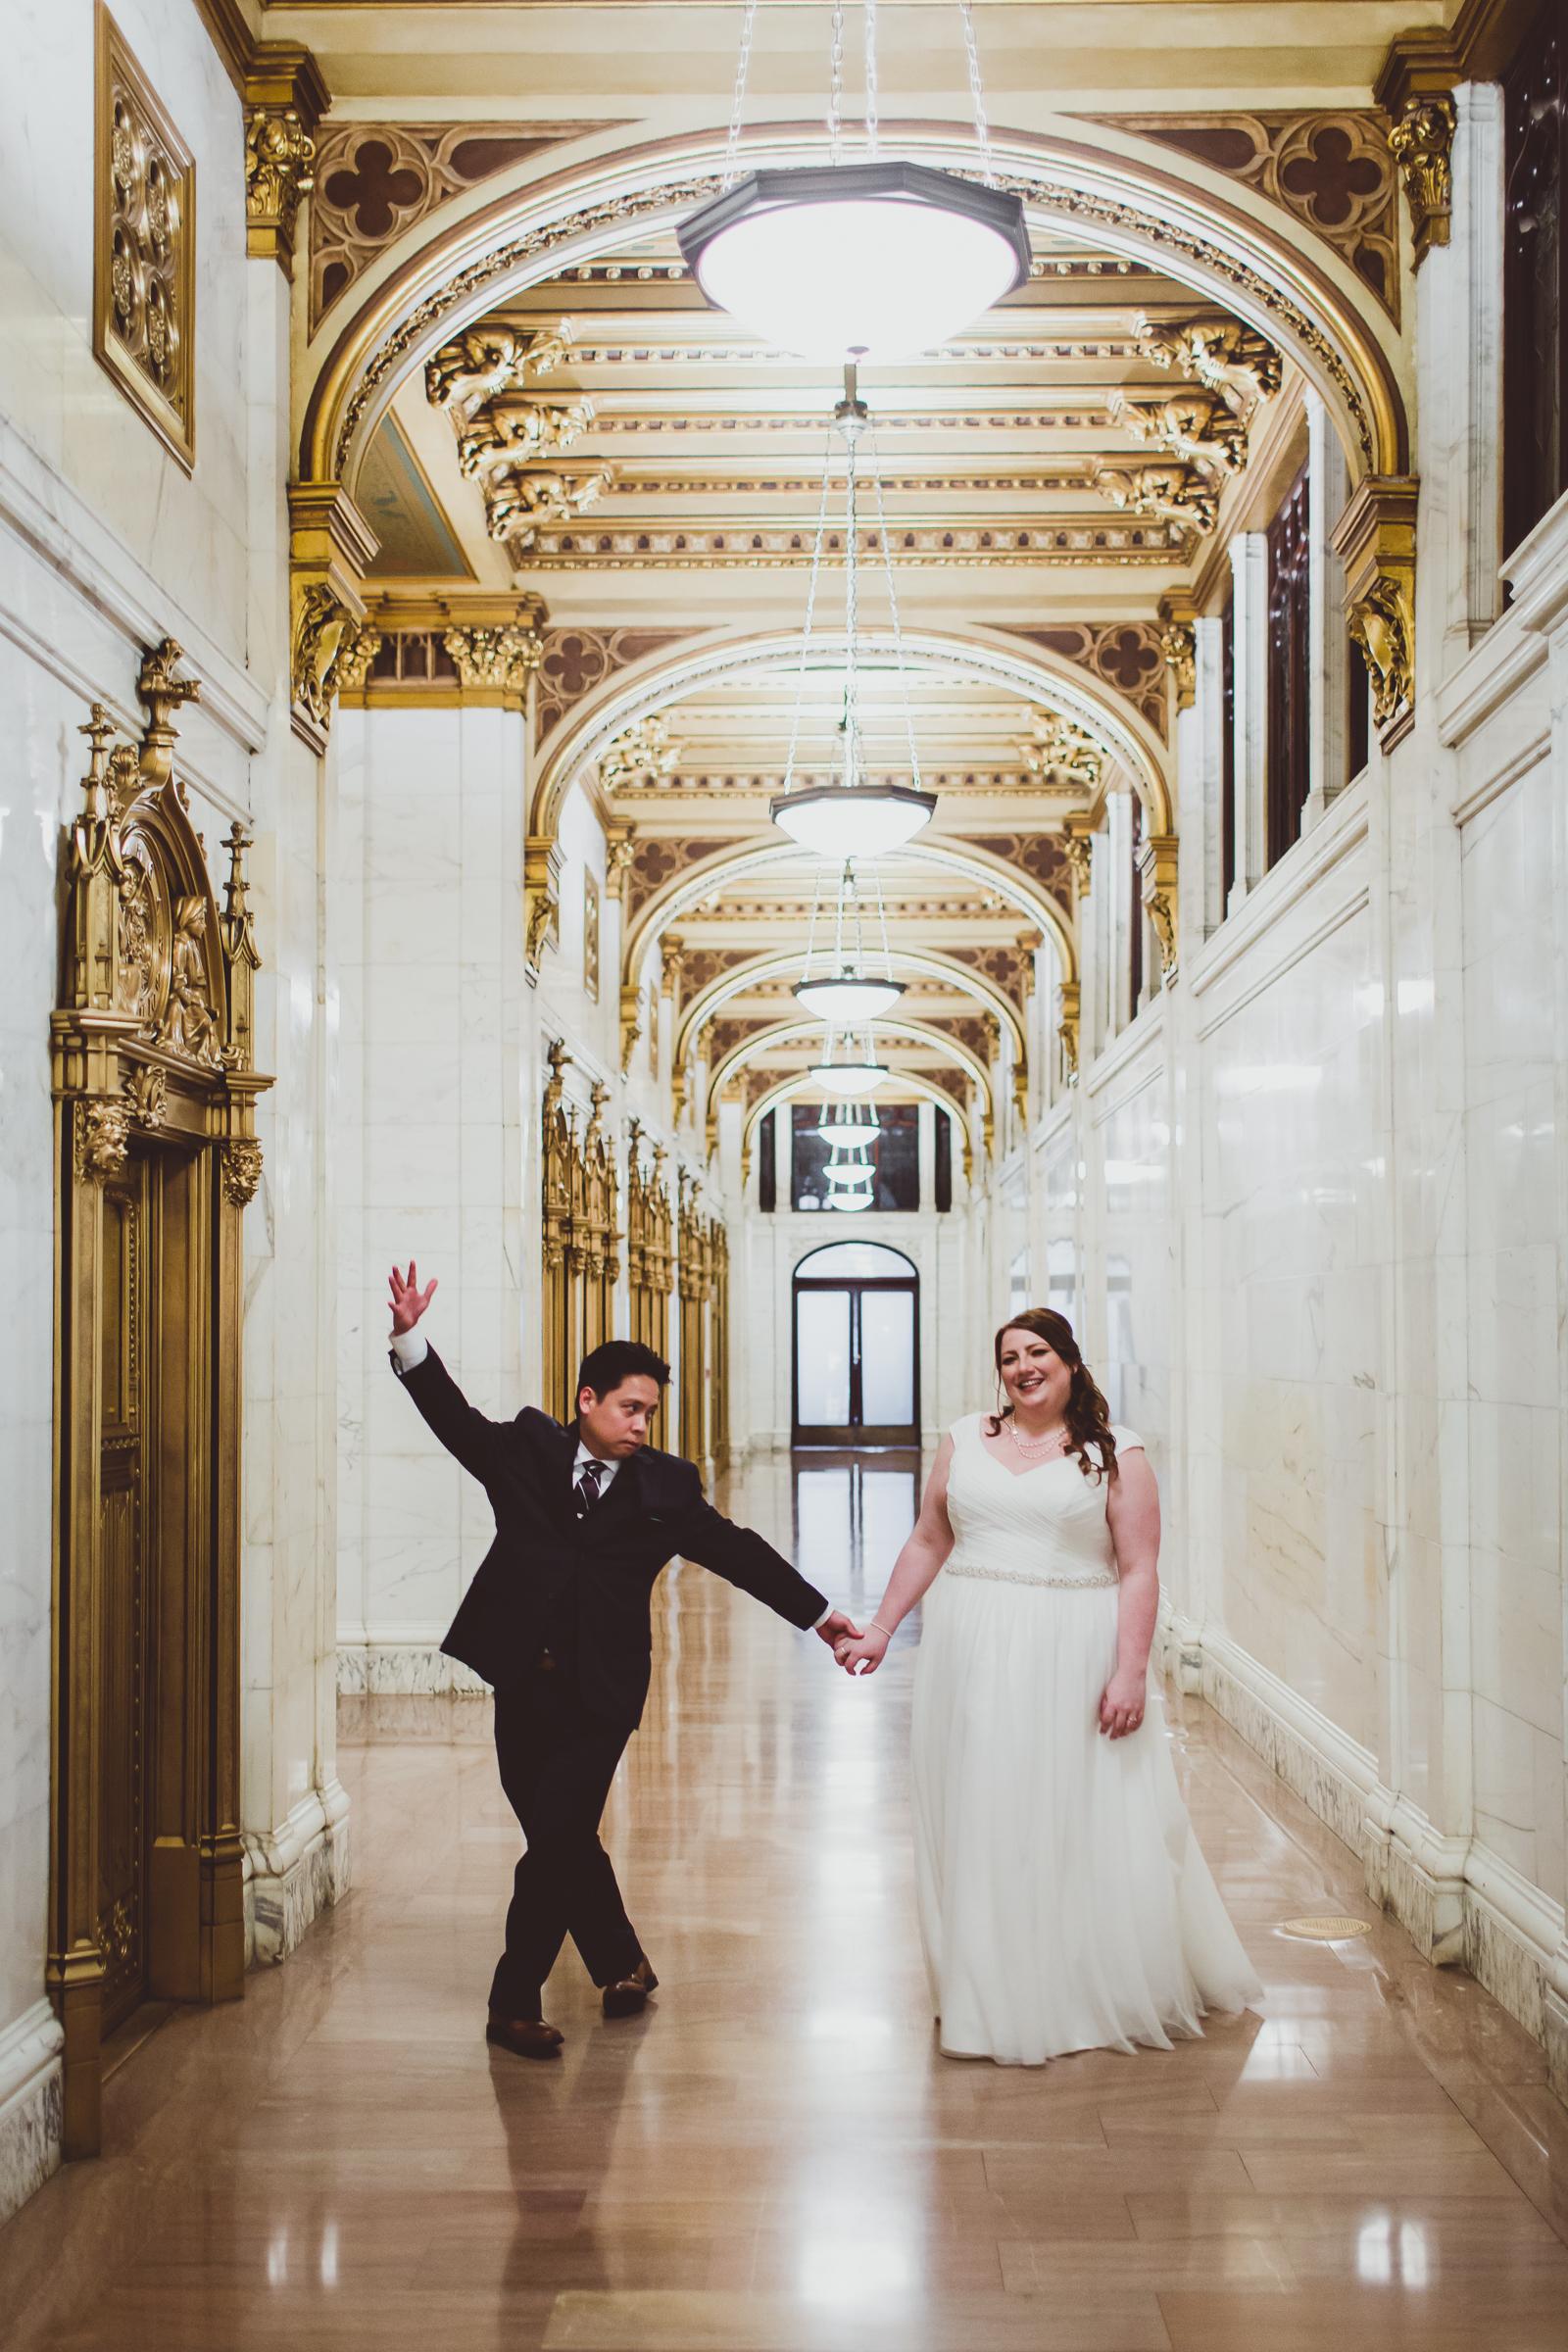 New-York-Documentary-Wedding-Photography-Best-Of-2017-by-Elvira-Kalviste-Photography-94.jpg